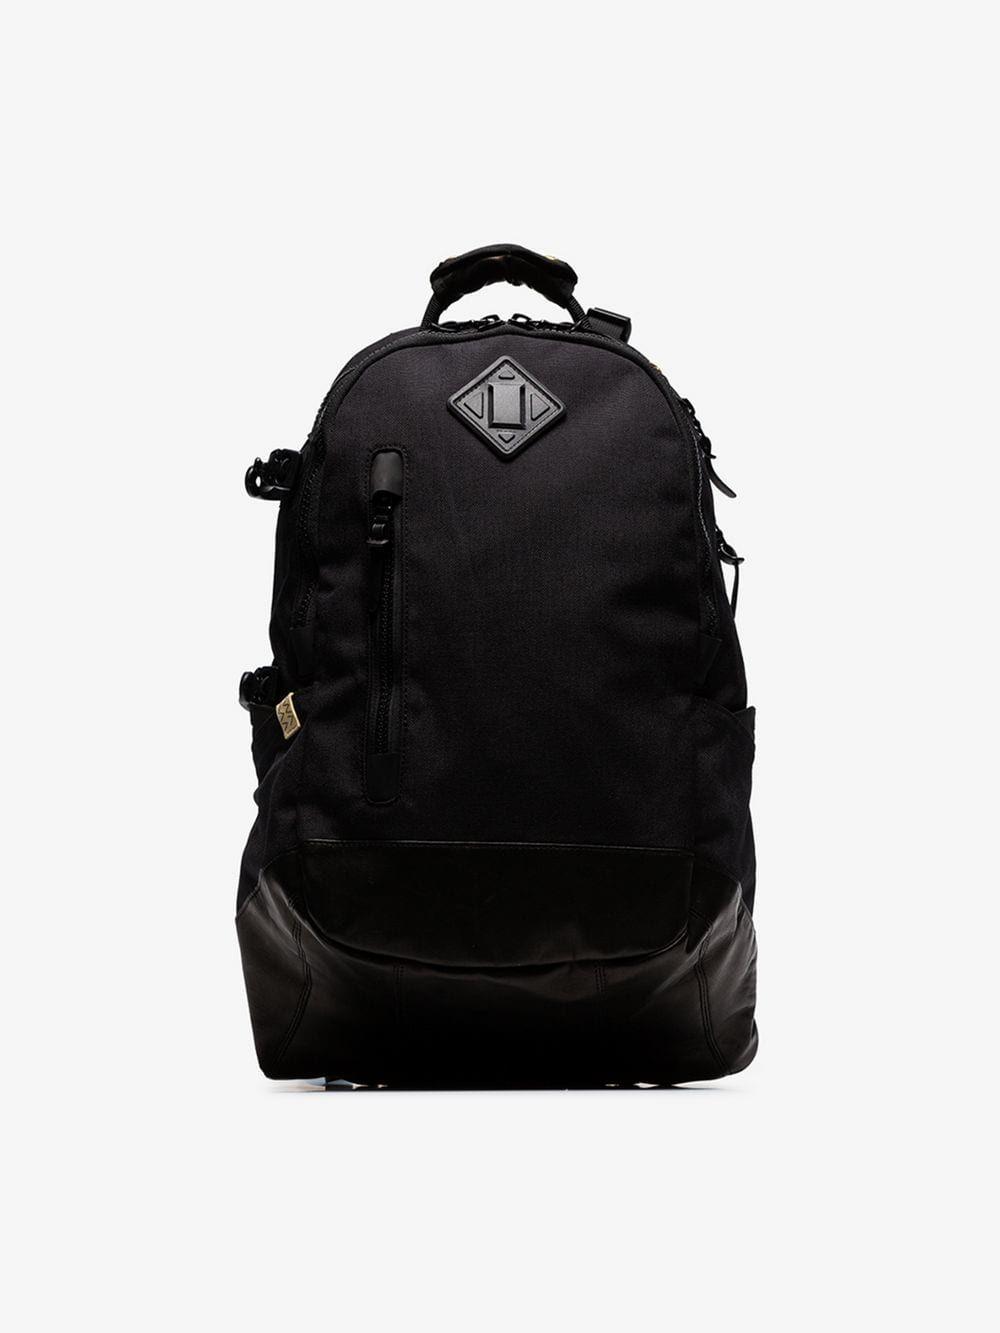 1f396fceb VISVIM VISVIM BLACK CORDURA 20L BACKPACK. #visvim #bags #backpacks ...